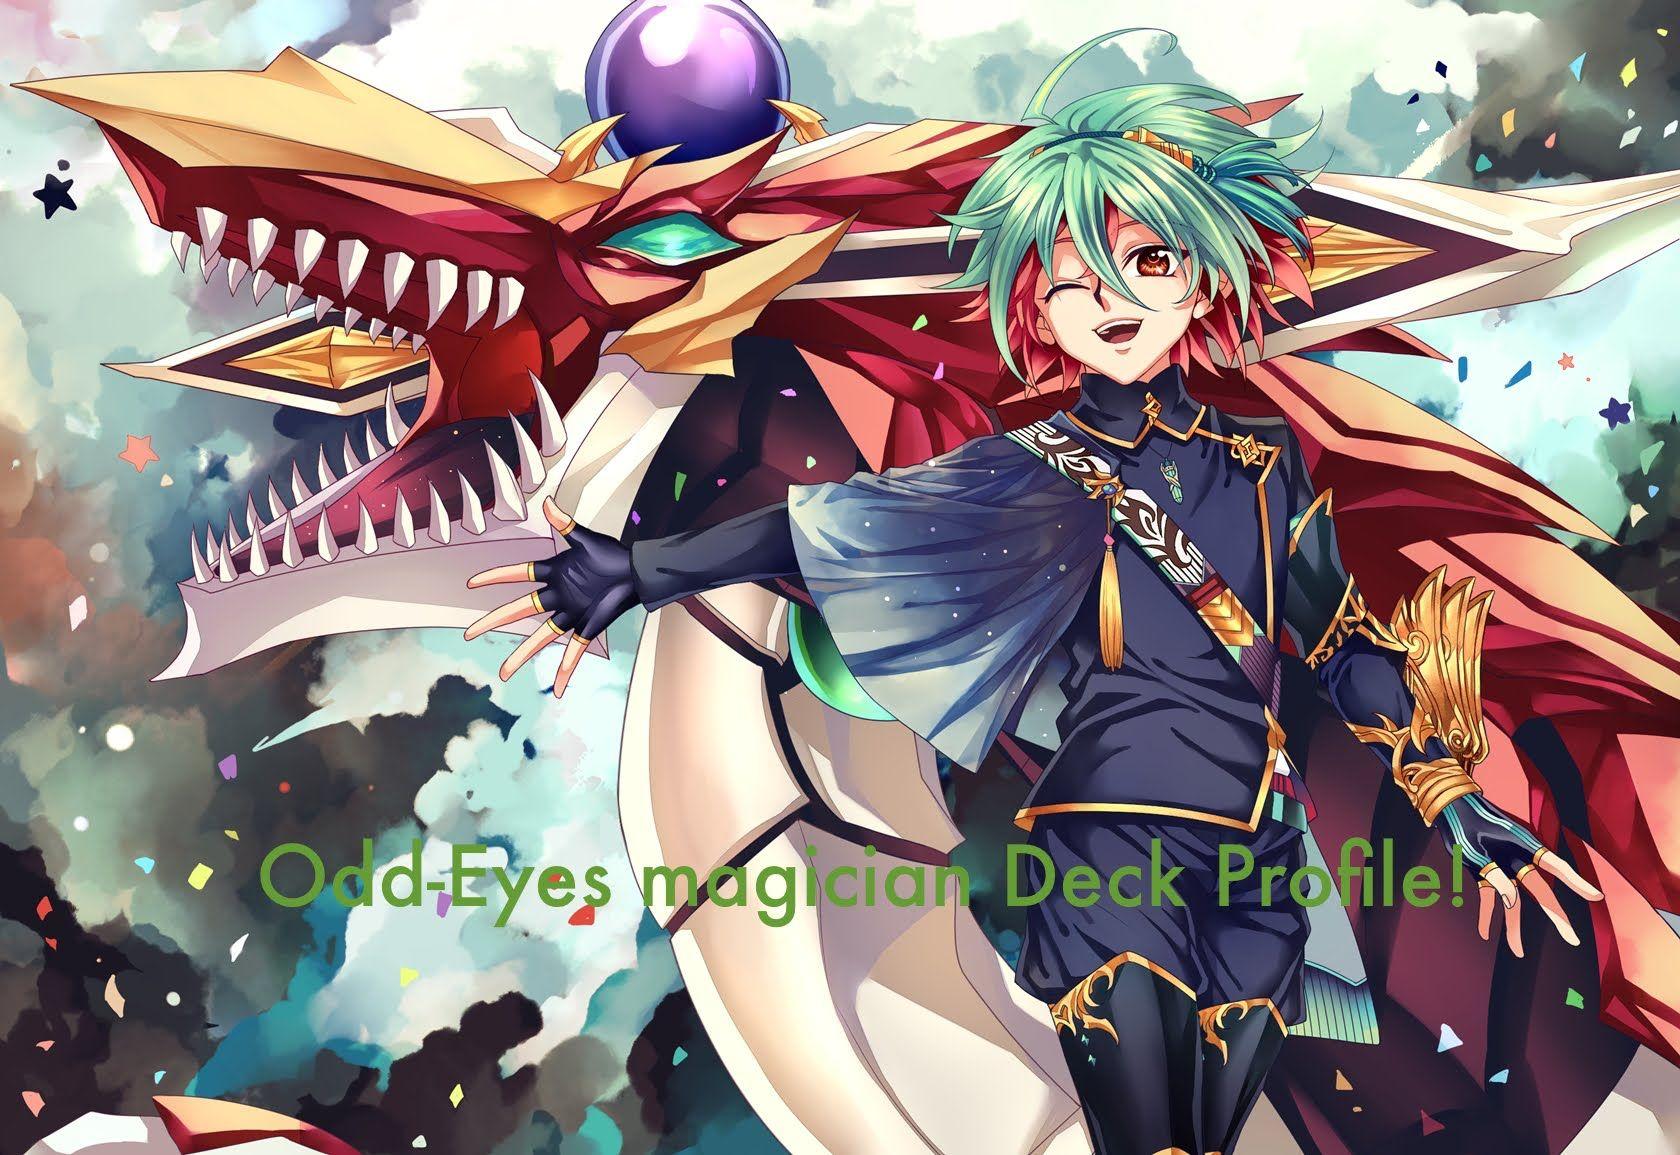 Oddeyes magician deck profile yugioh yuya yugioh